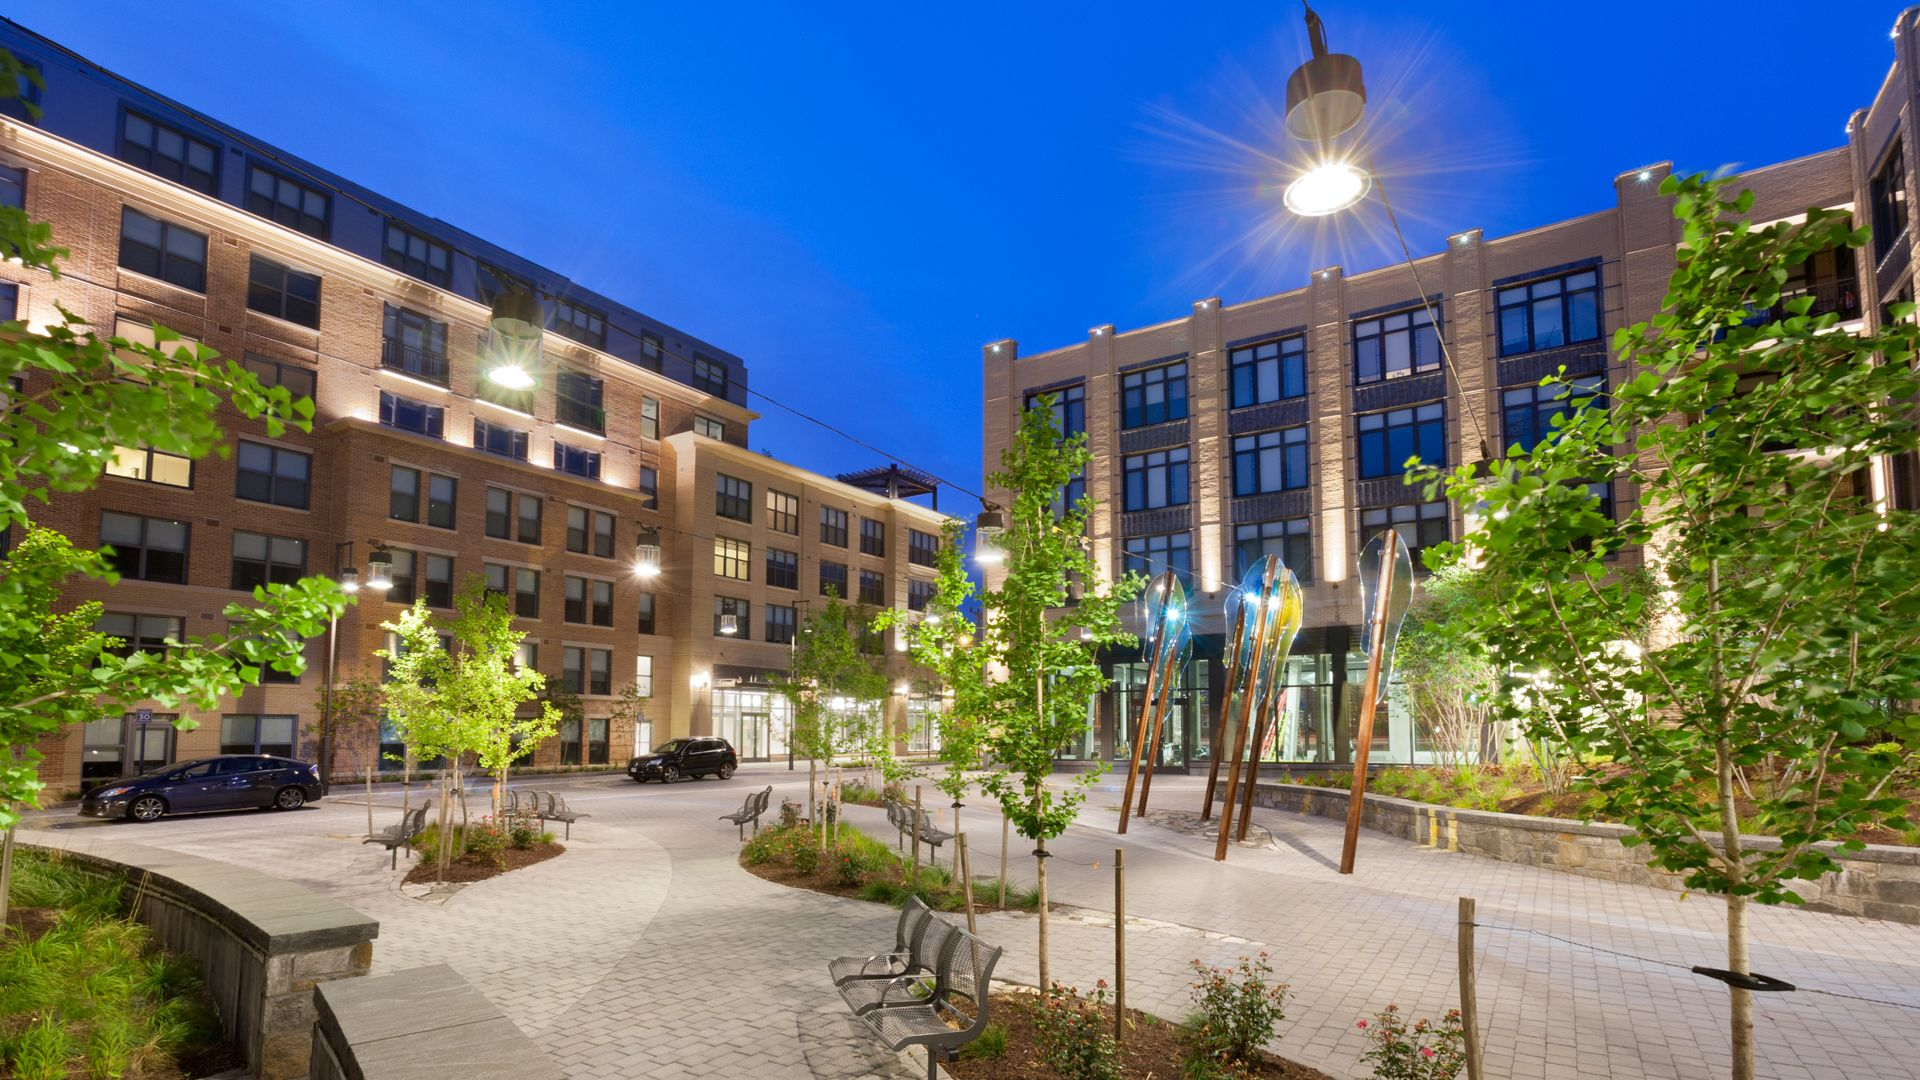 1111 Belle Pre Apartments - Courtyard